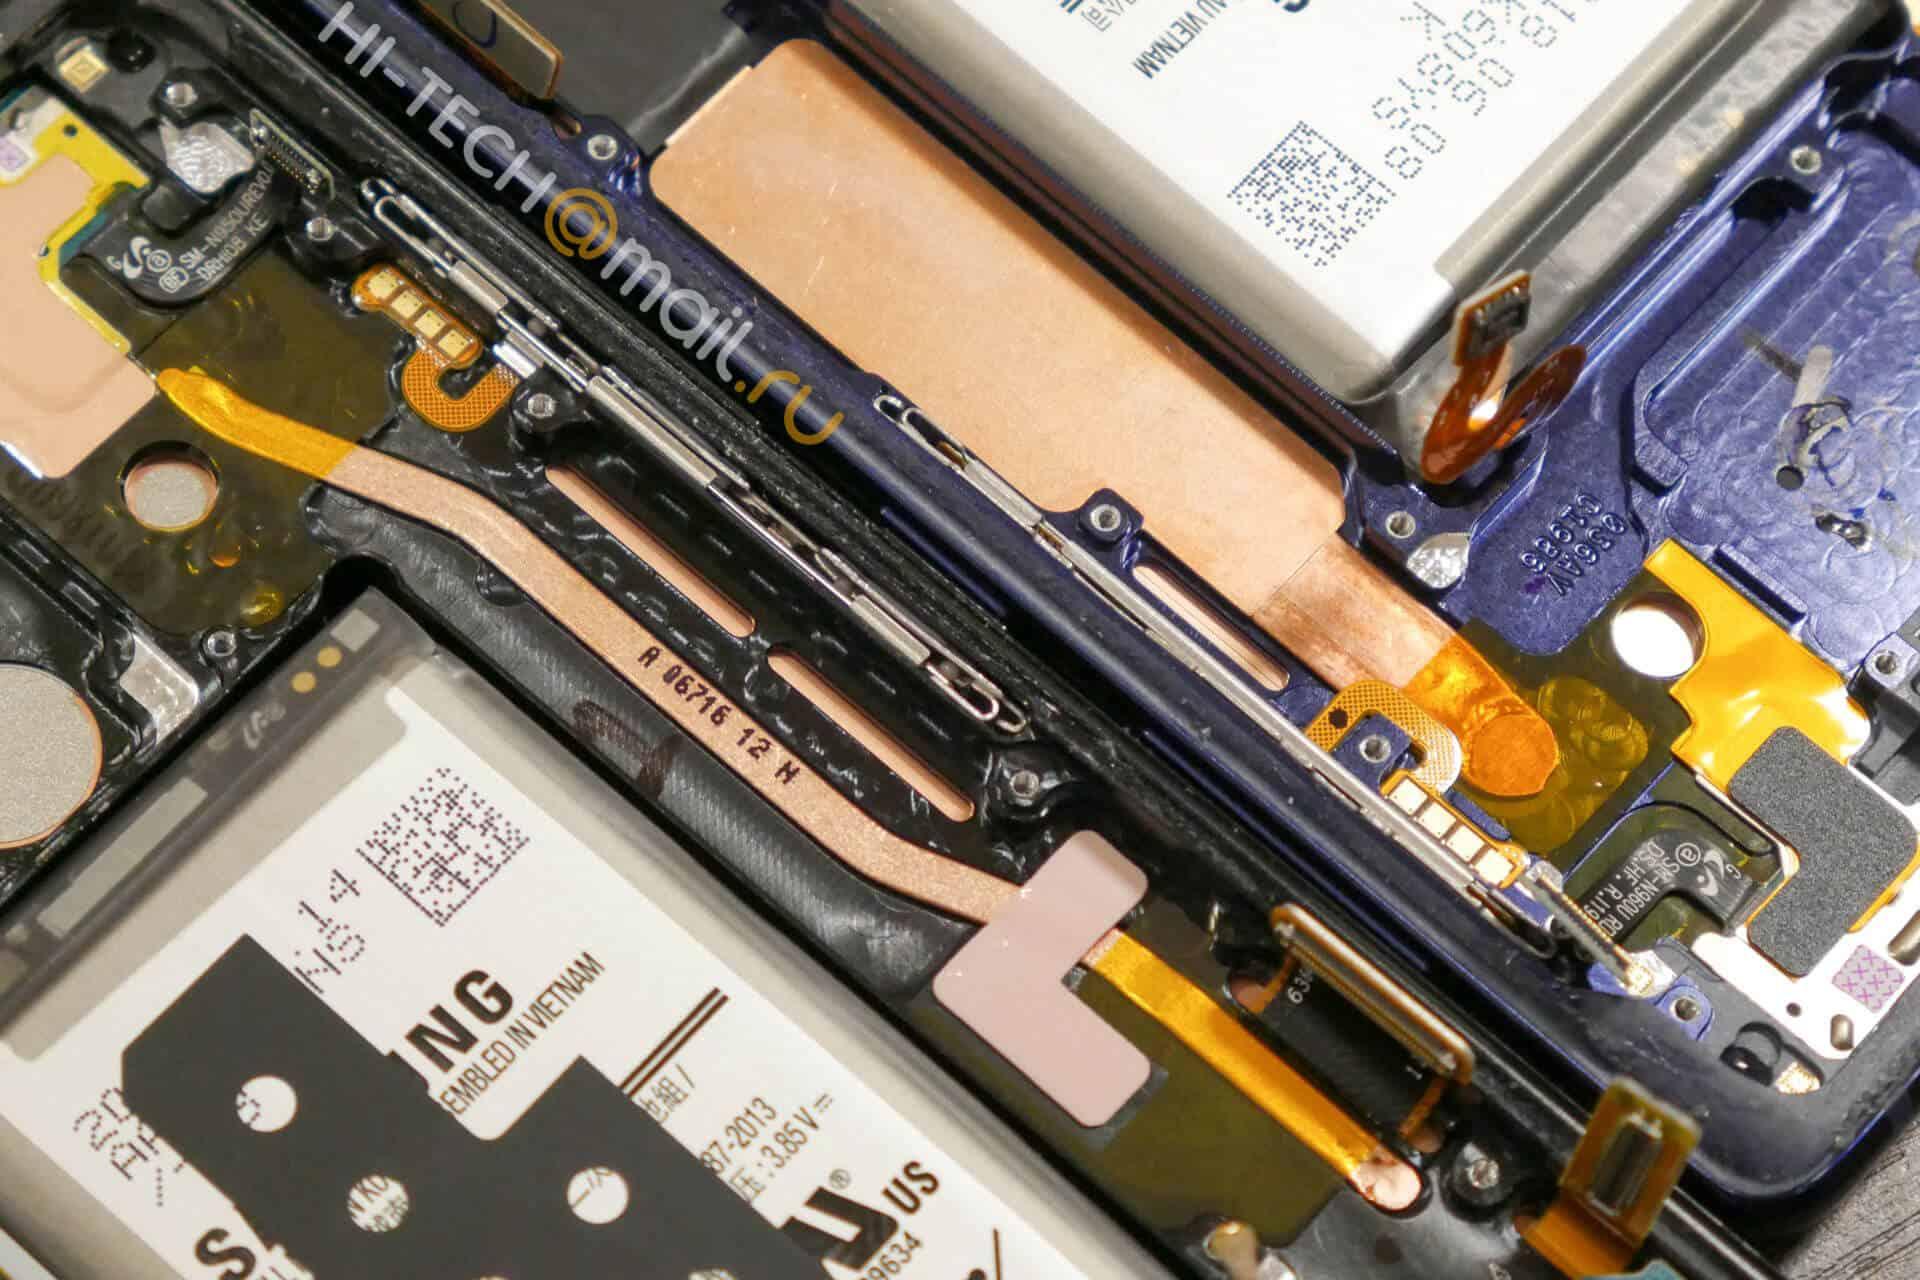 Galaxy Note 8 v Galaxy Note 9 teardown from Hi Tech Mail RU 12